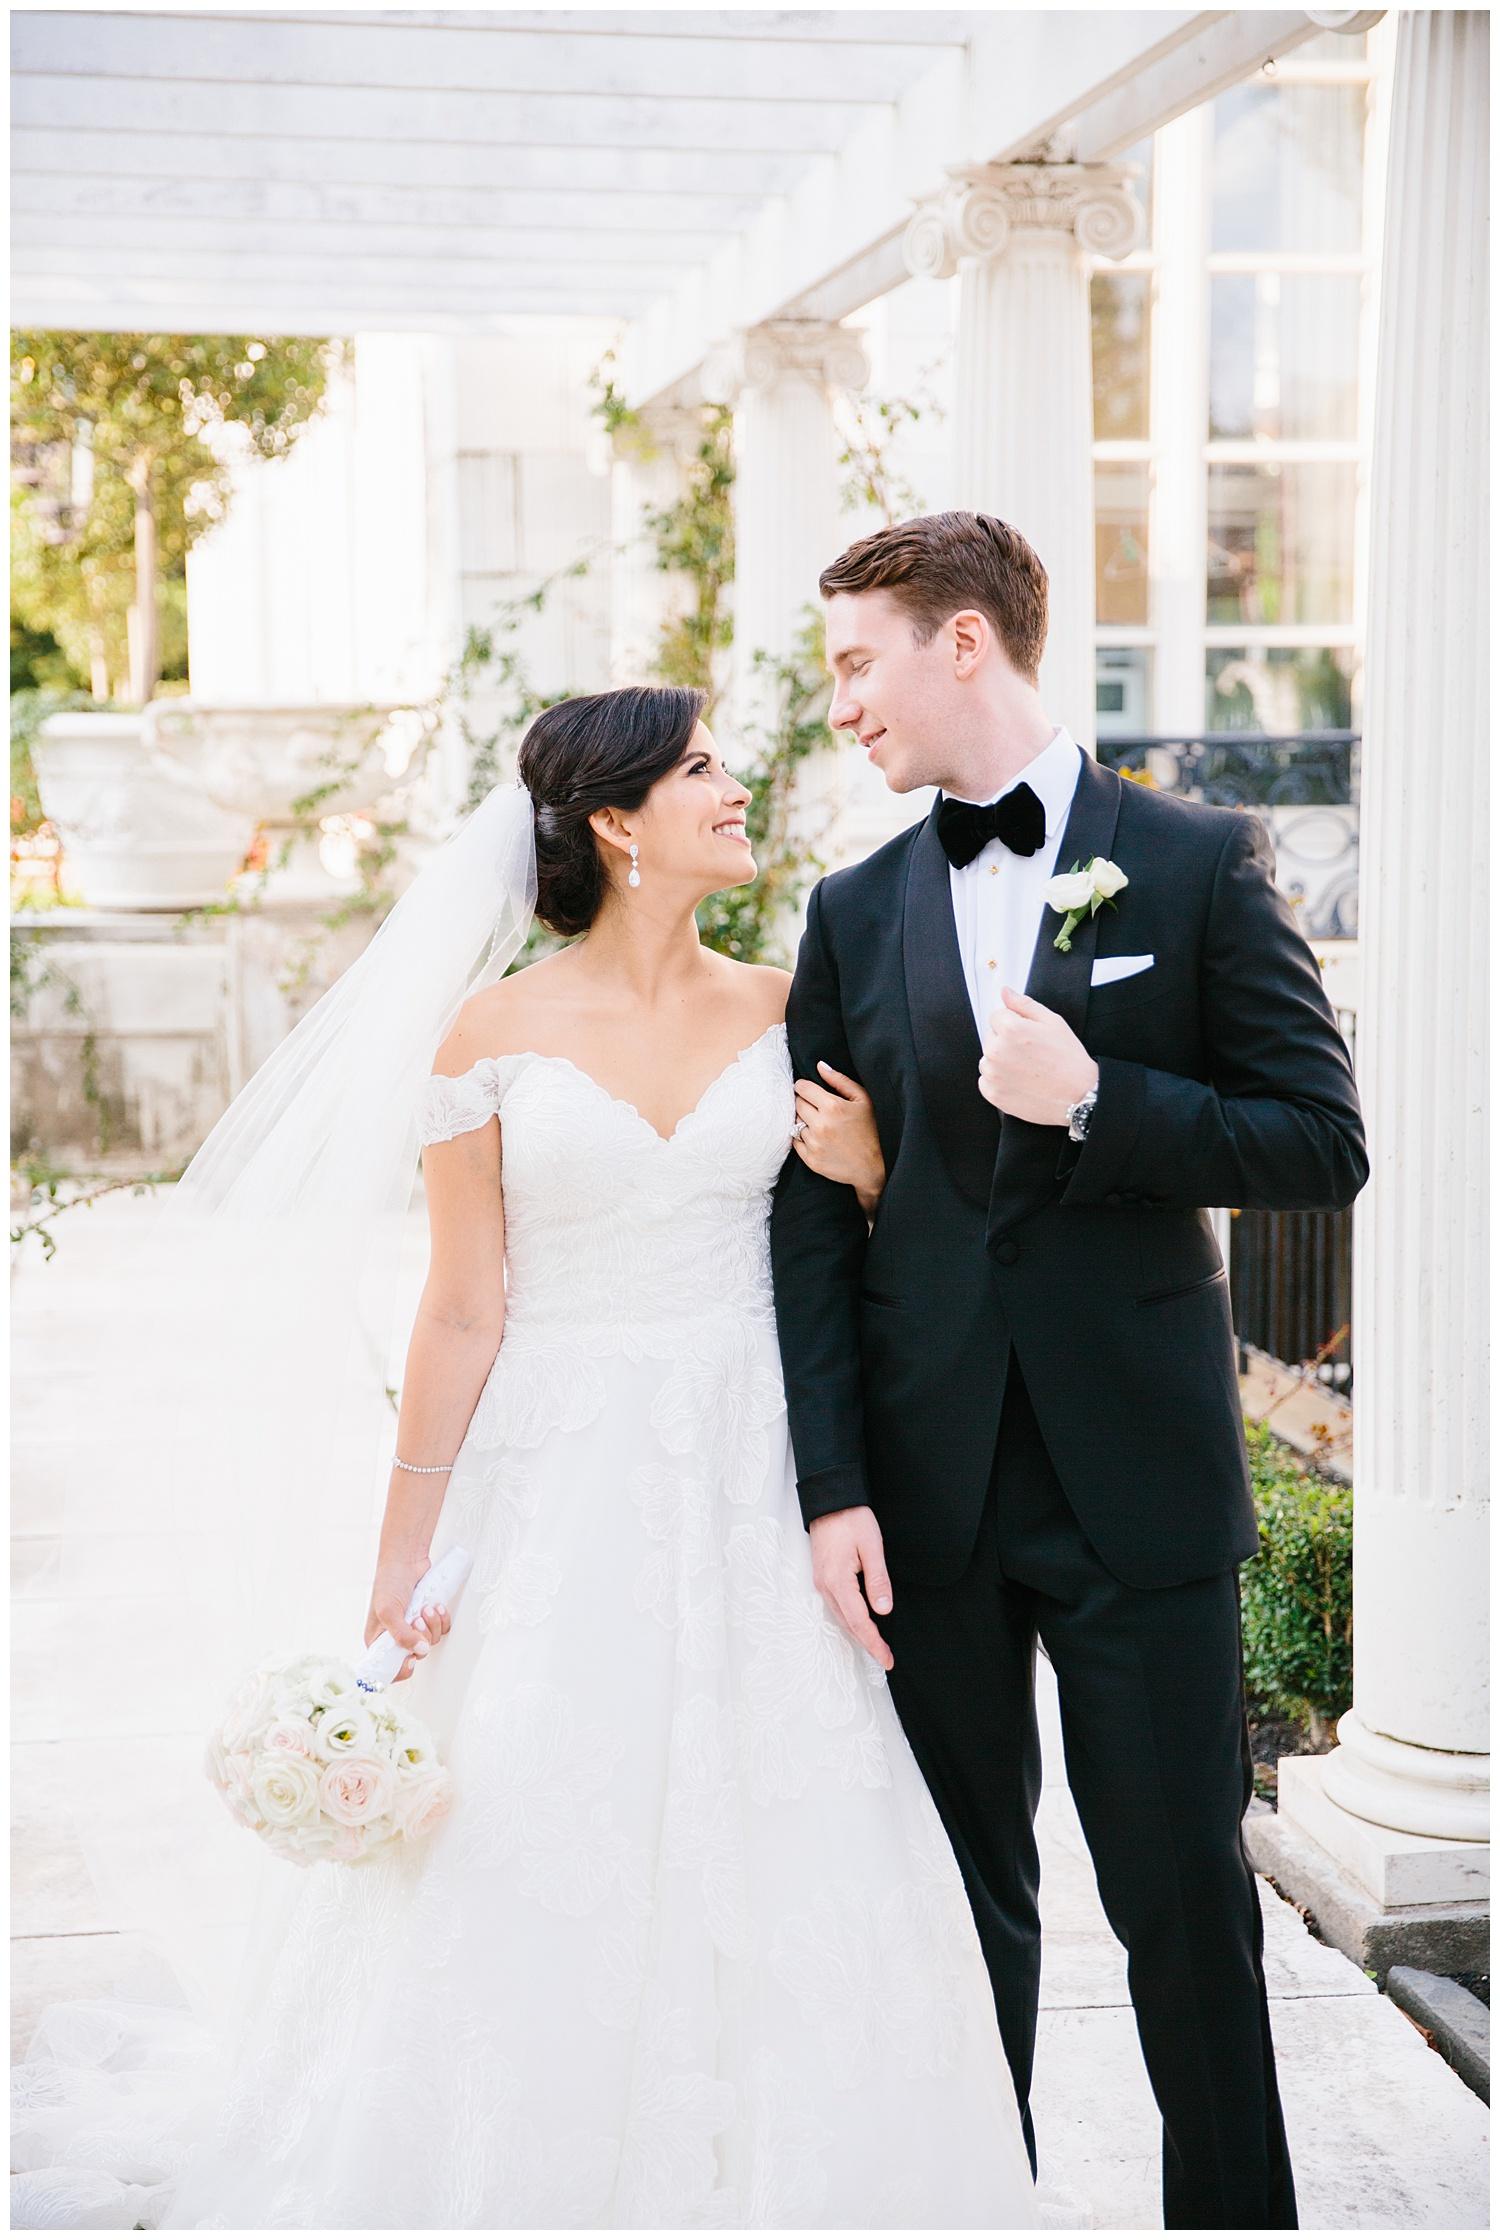 Stephen_Nathalie_Rosecliff_Mansion_Wedding_011.jpeg